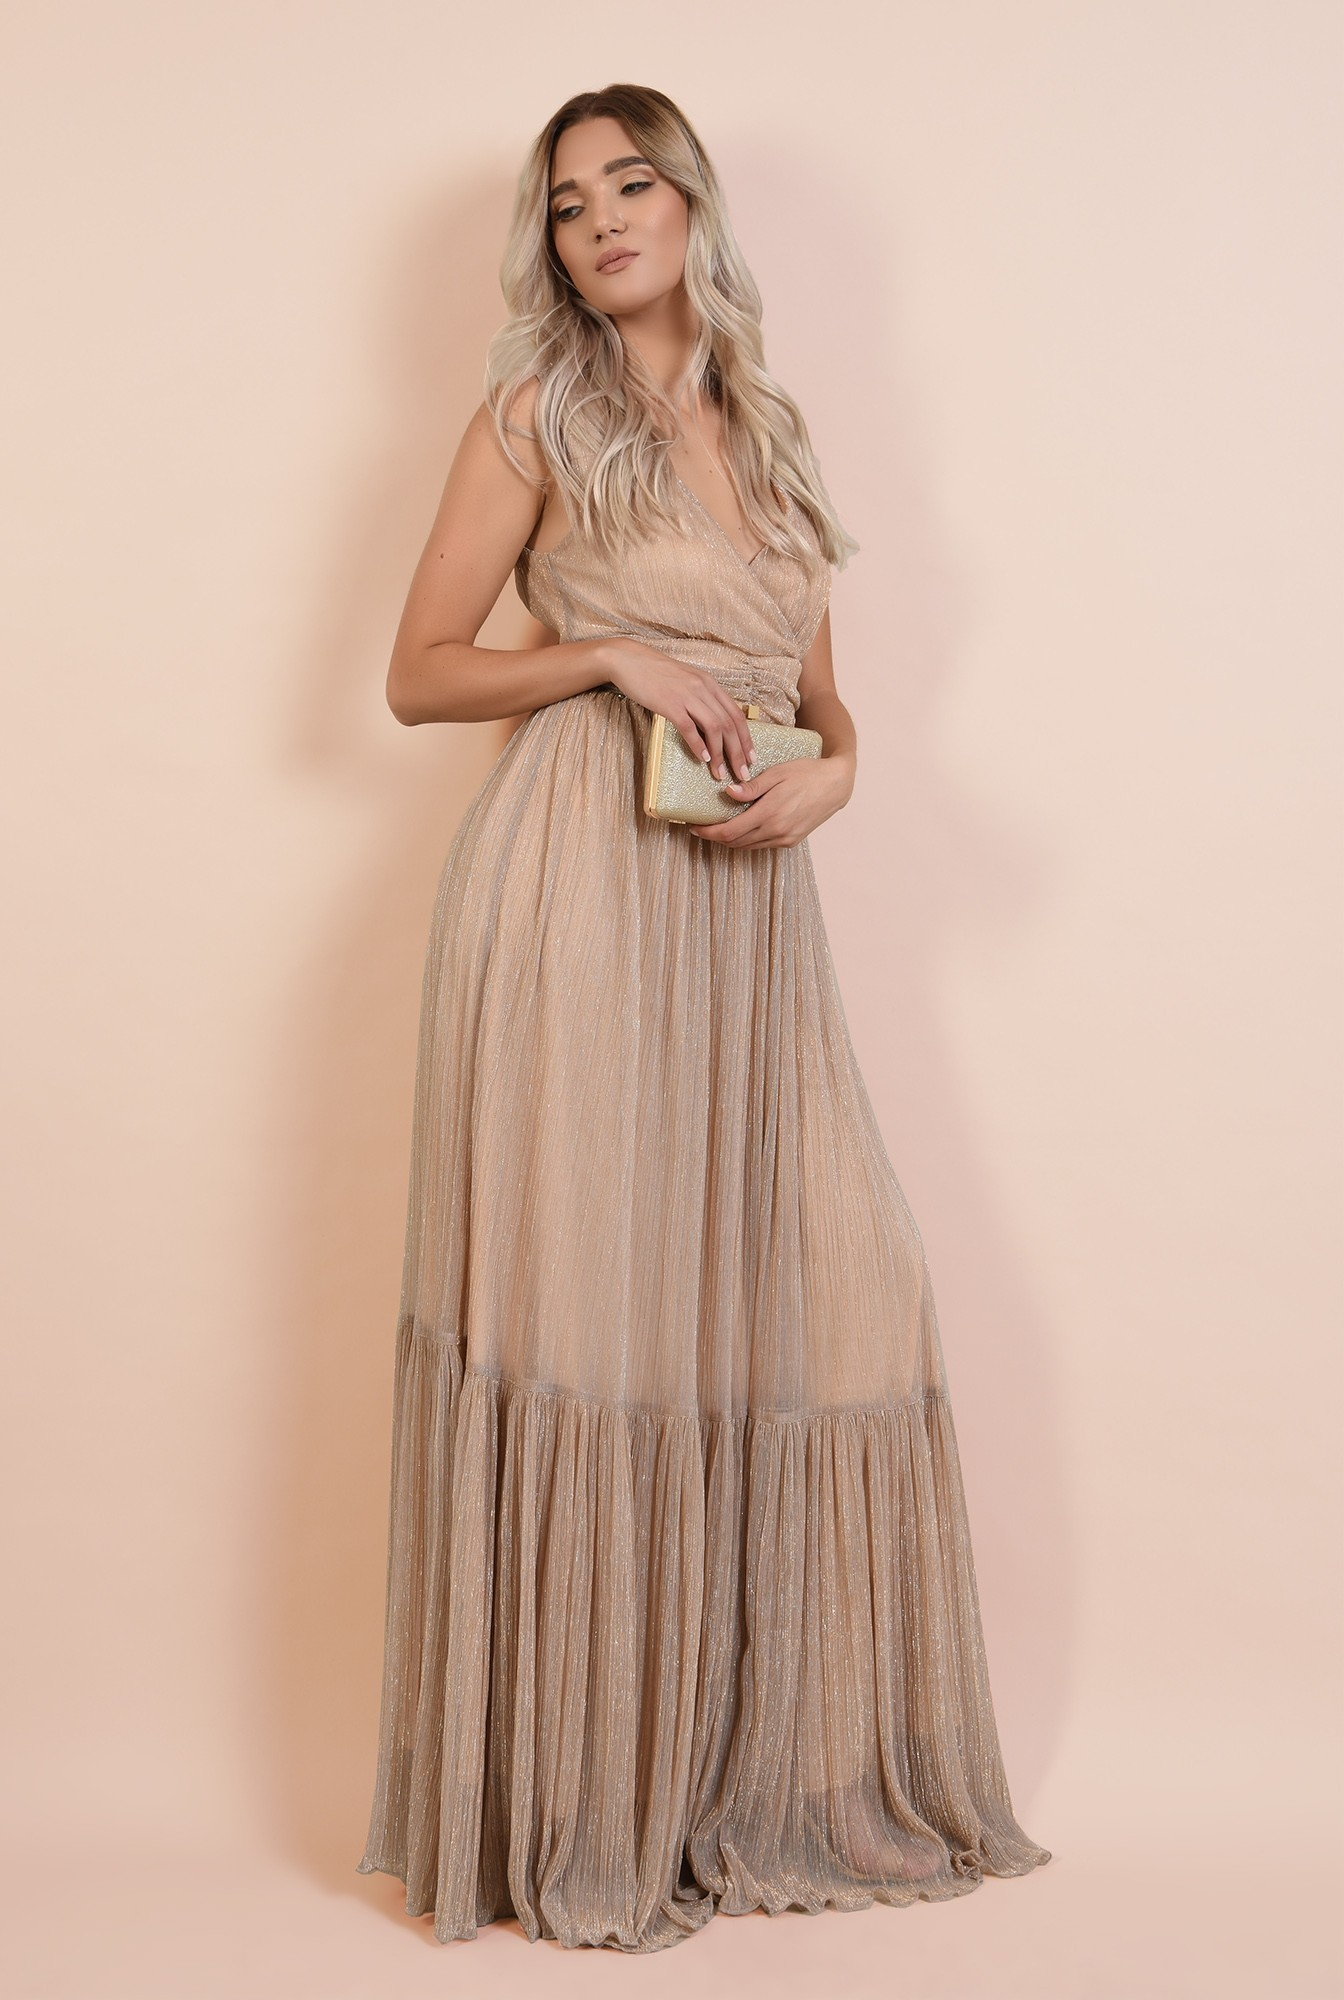 3 - 360 - rochie lunga, de seara, lurex, decolteu in V, betelie fronsata, Poema